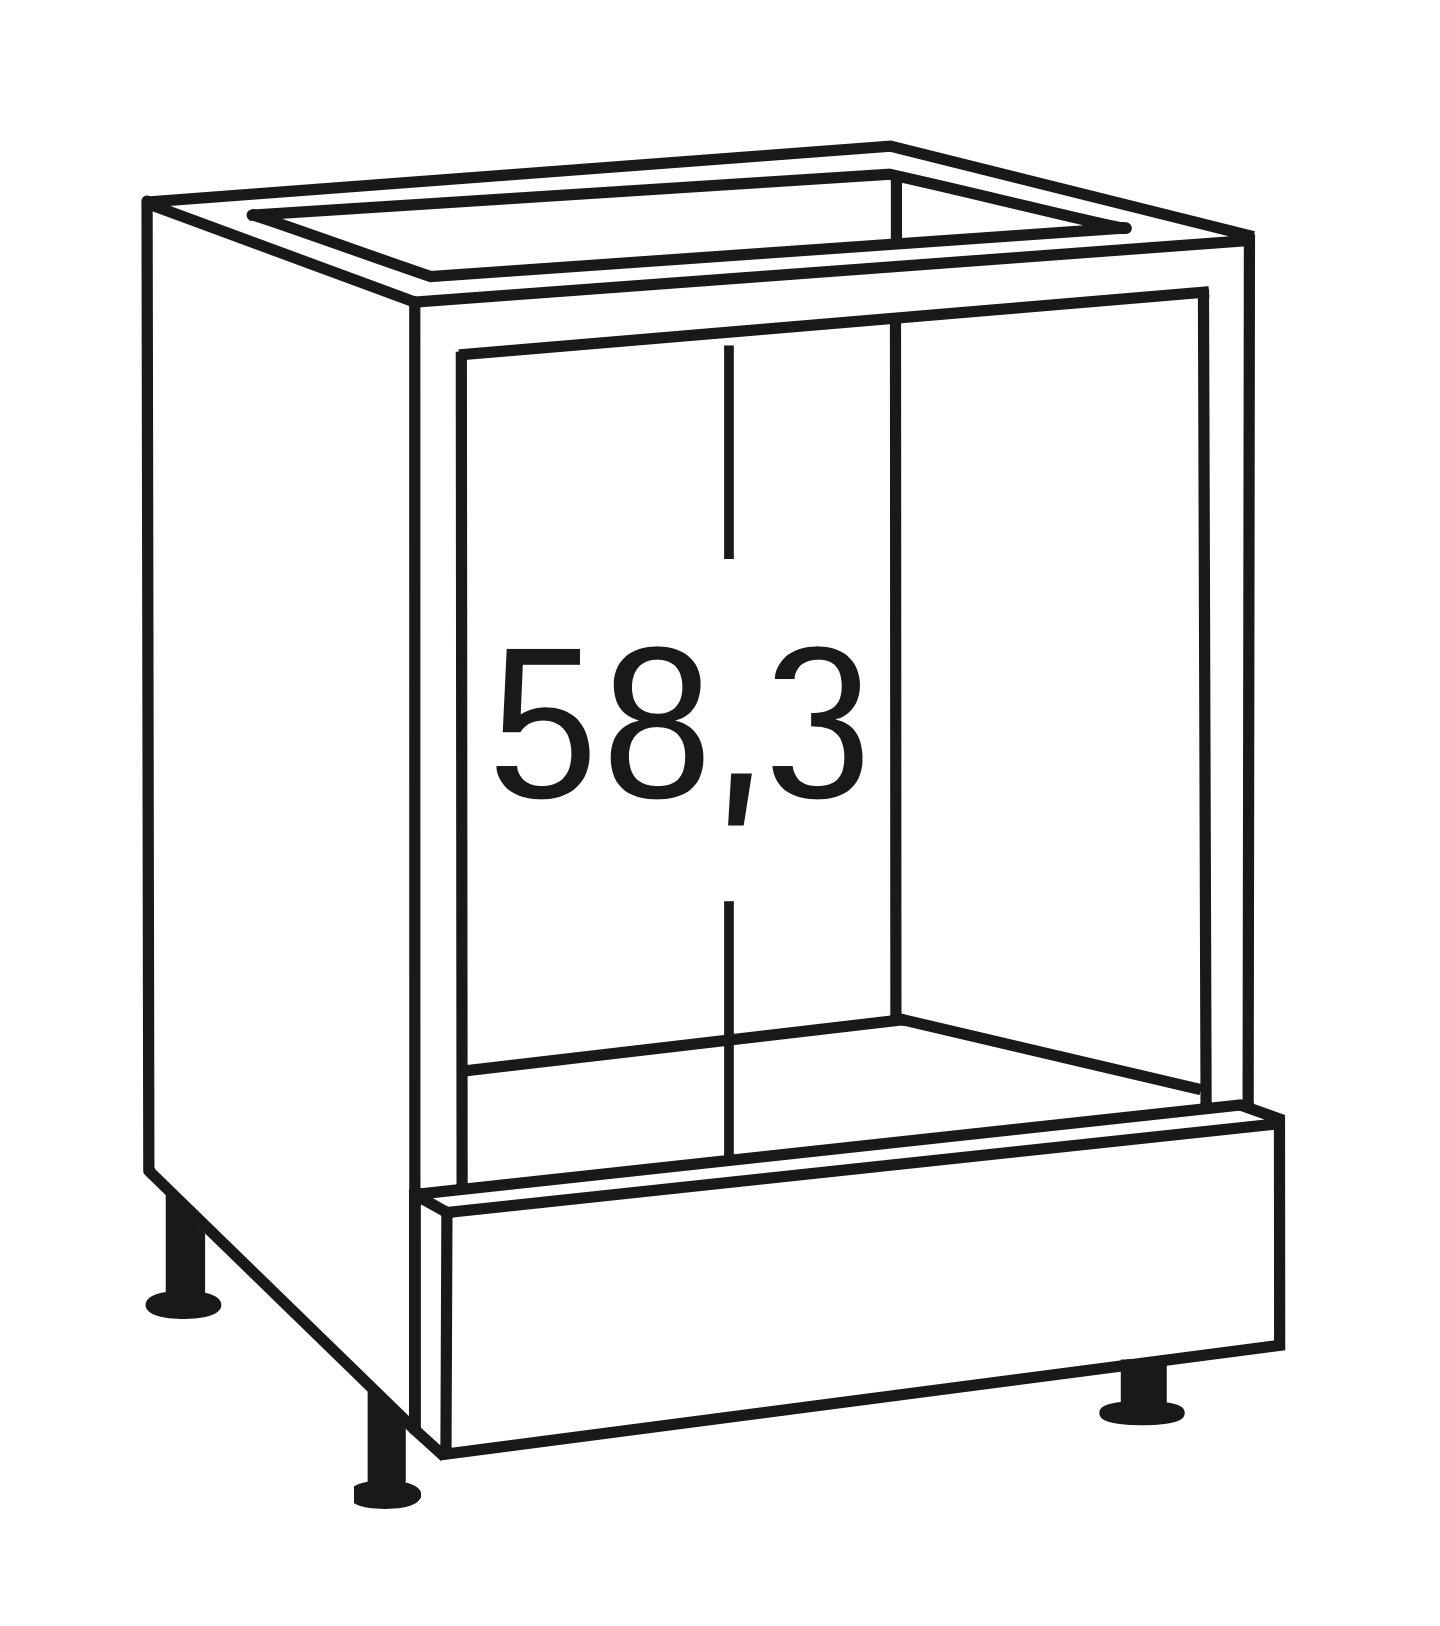 U634-8